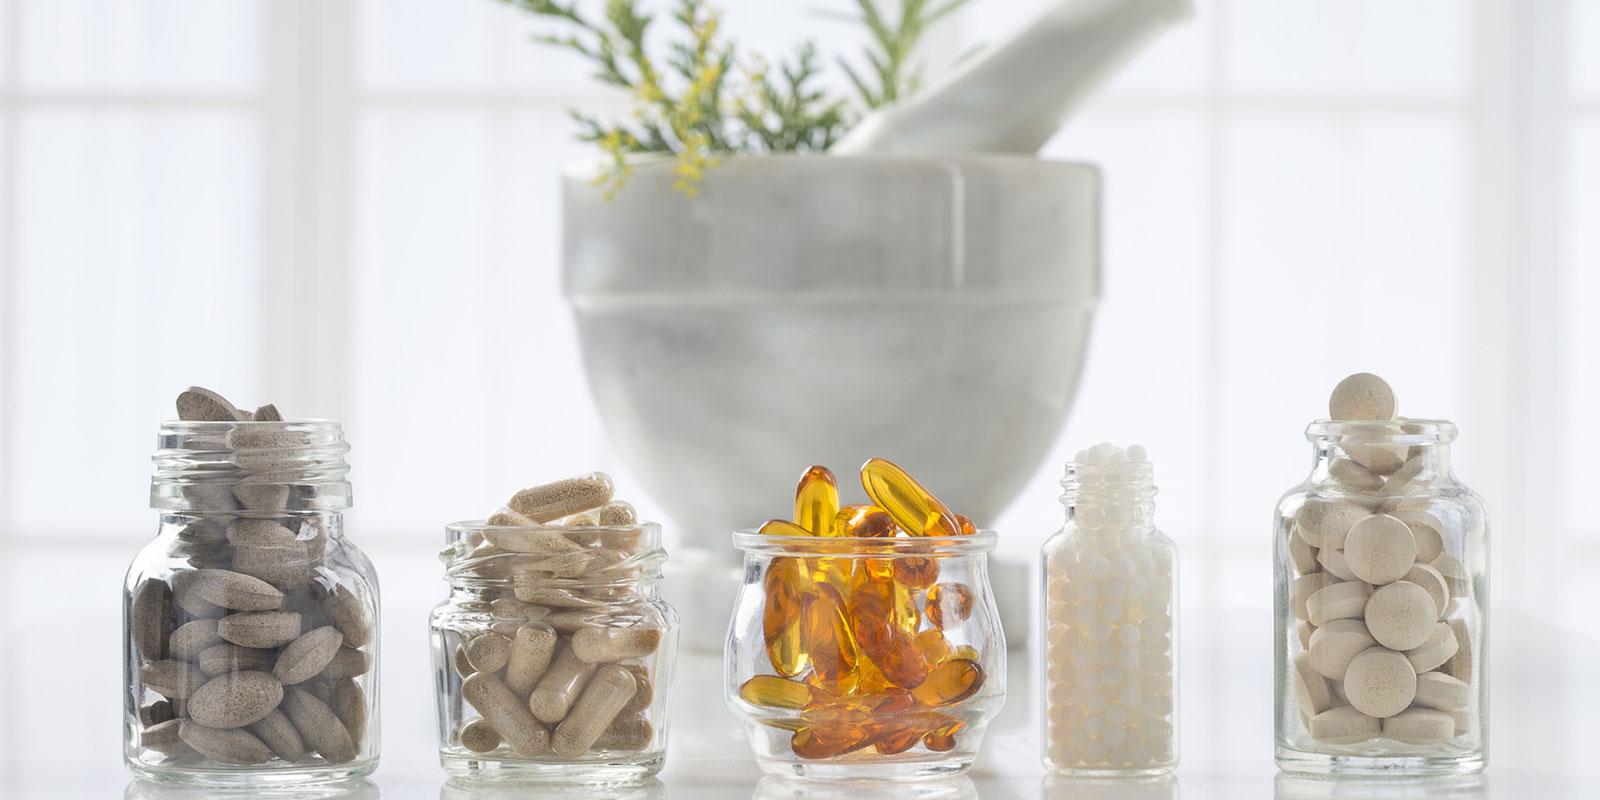 aromatherapie-pranarom-wallers-bellaing-haveluy-helesmes